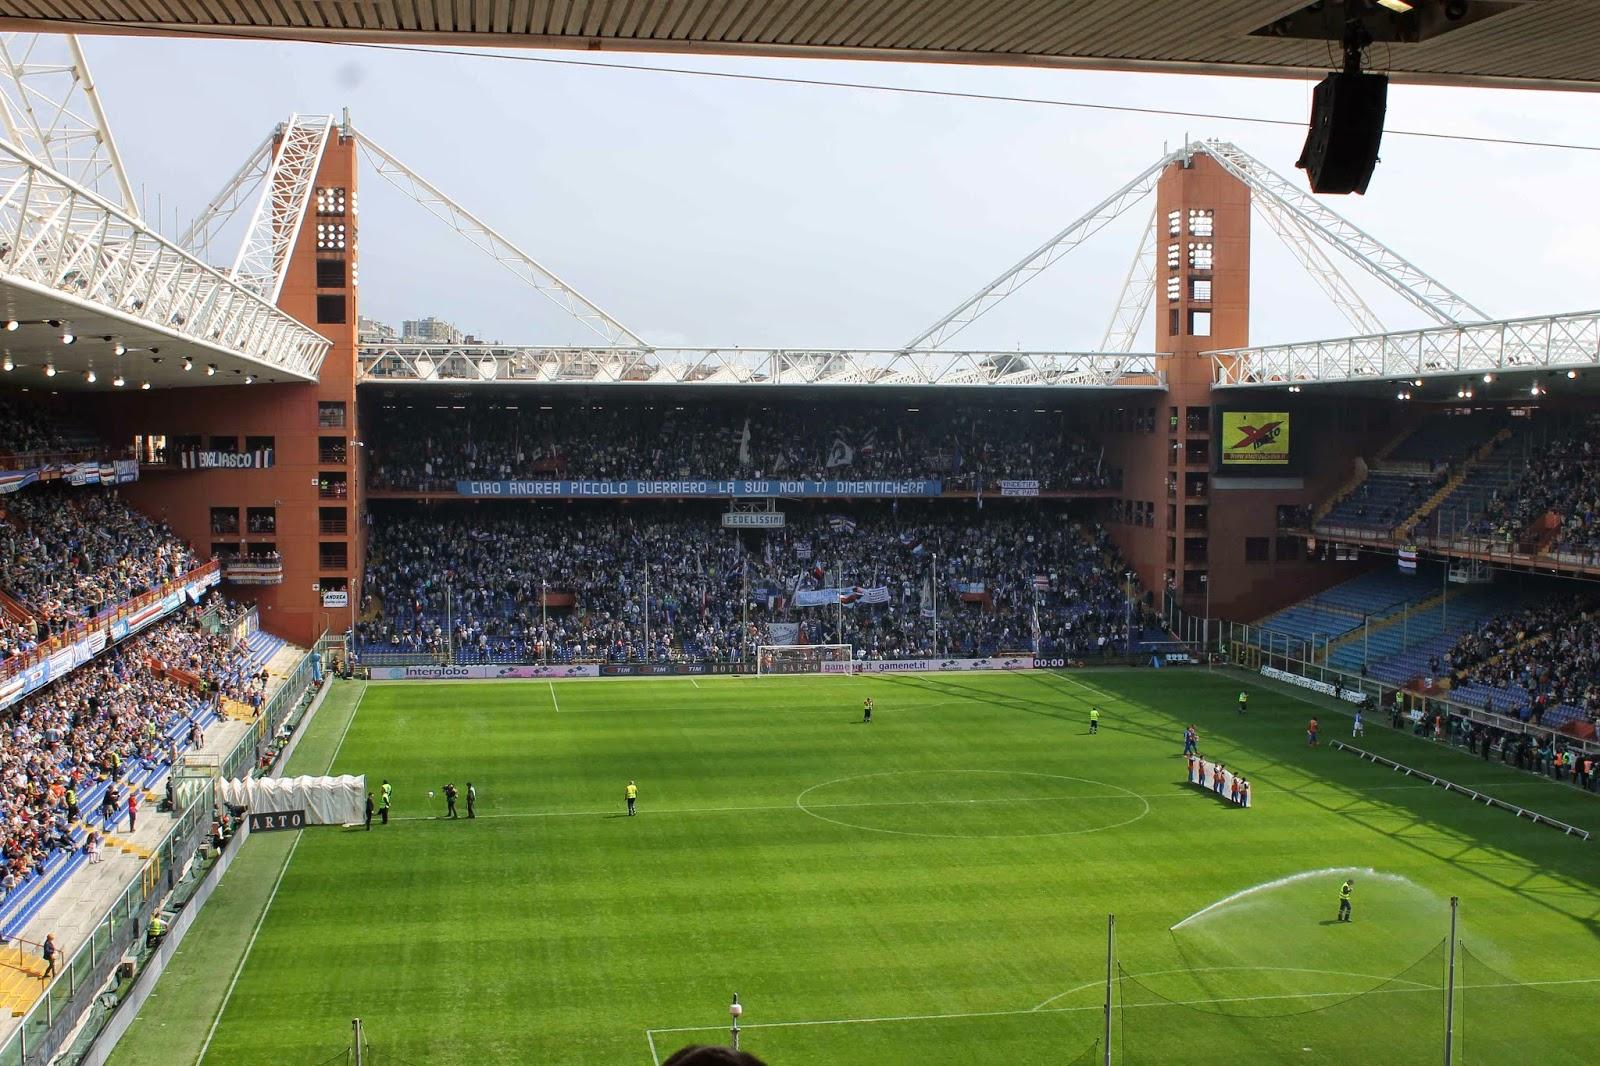 Sampdoria Genua Stadion